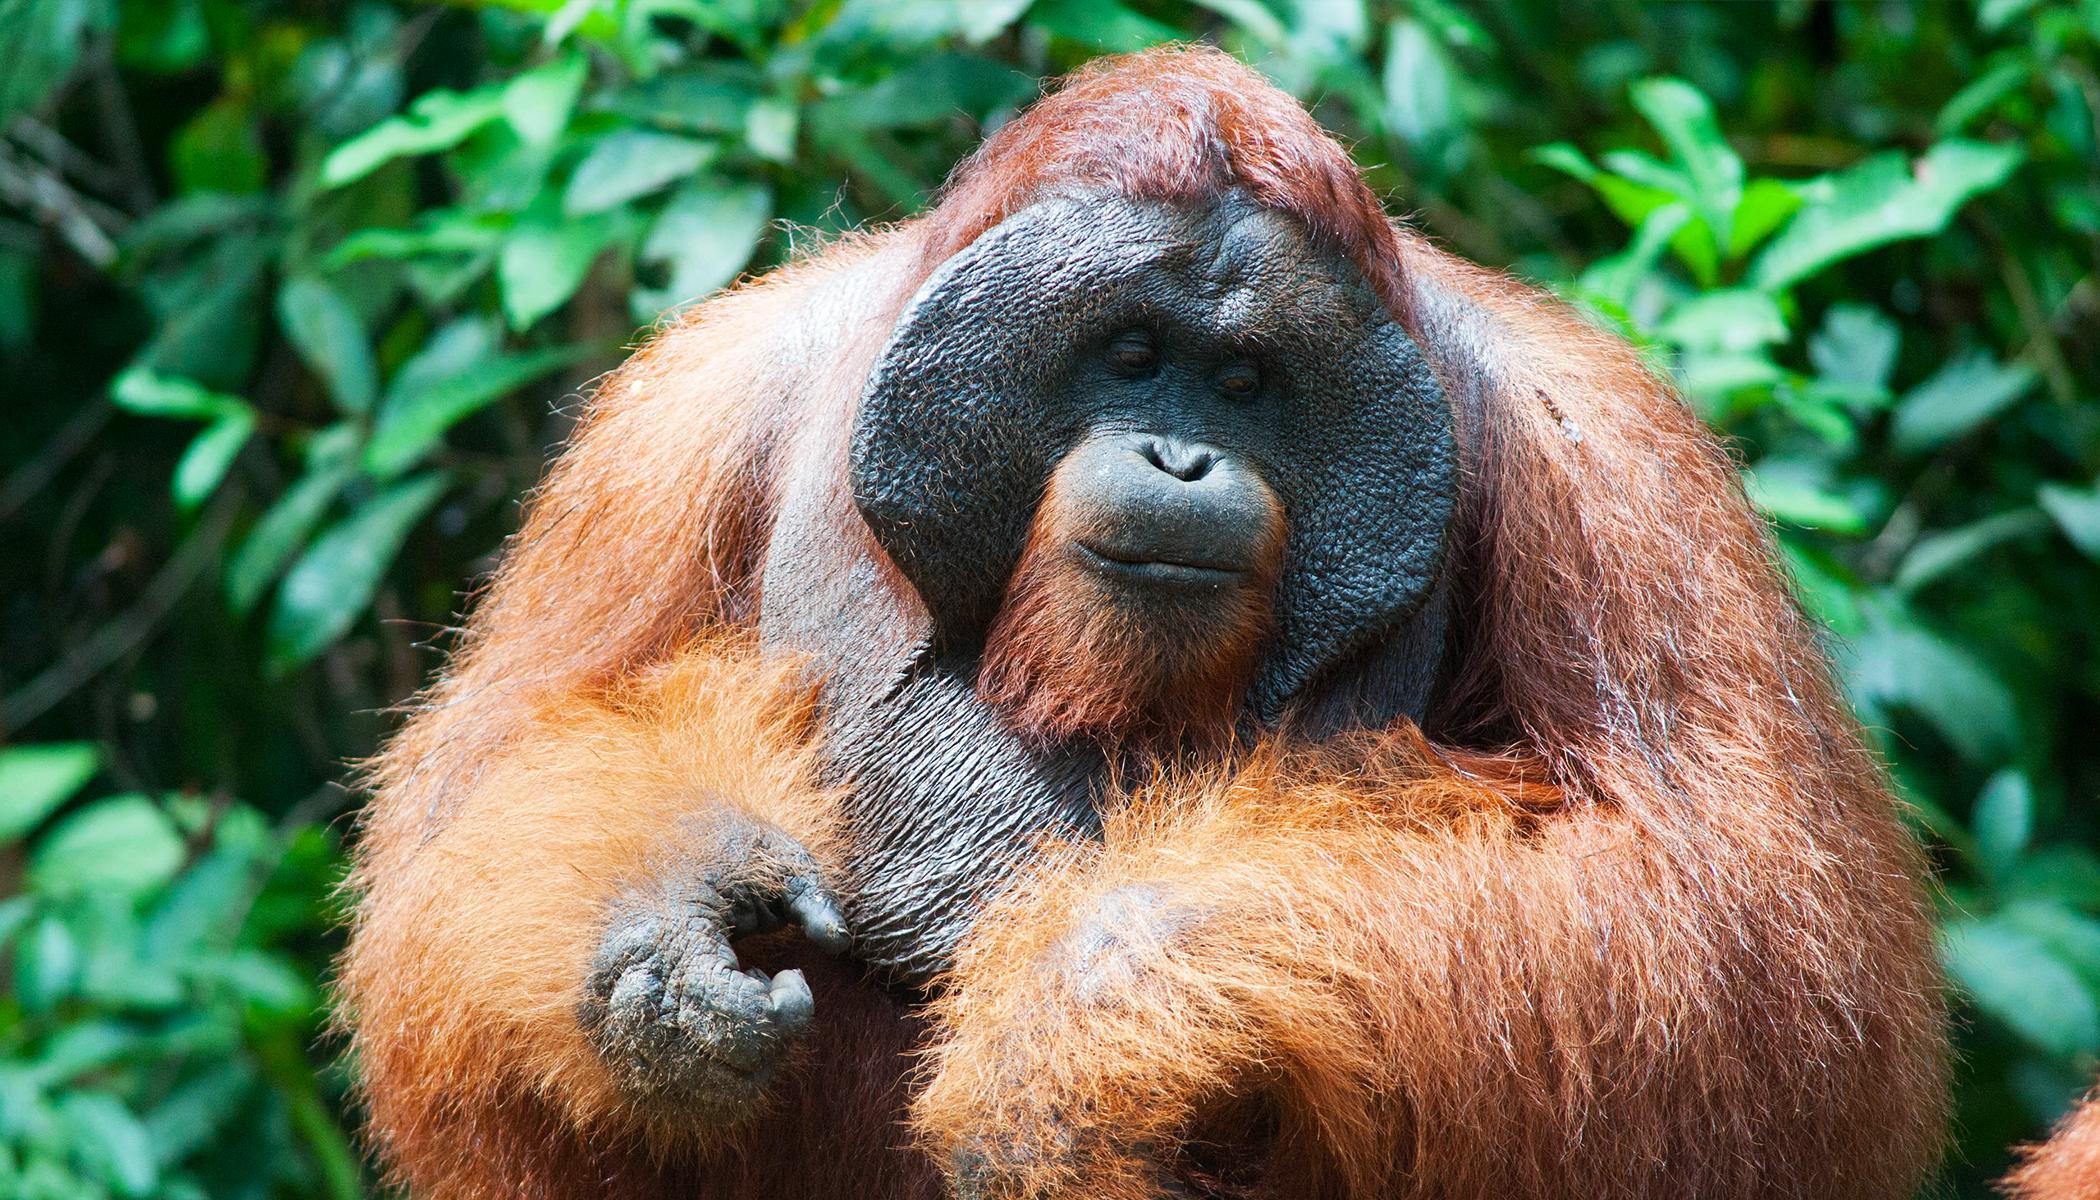 Video: Emotional Orangutan 'Kisses' Pregnant Woman's Baby Bump Through the Glass at Zoo in UK